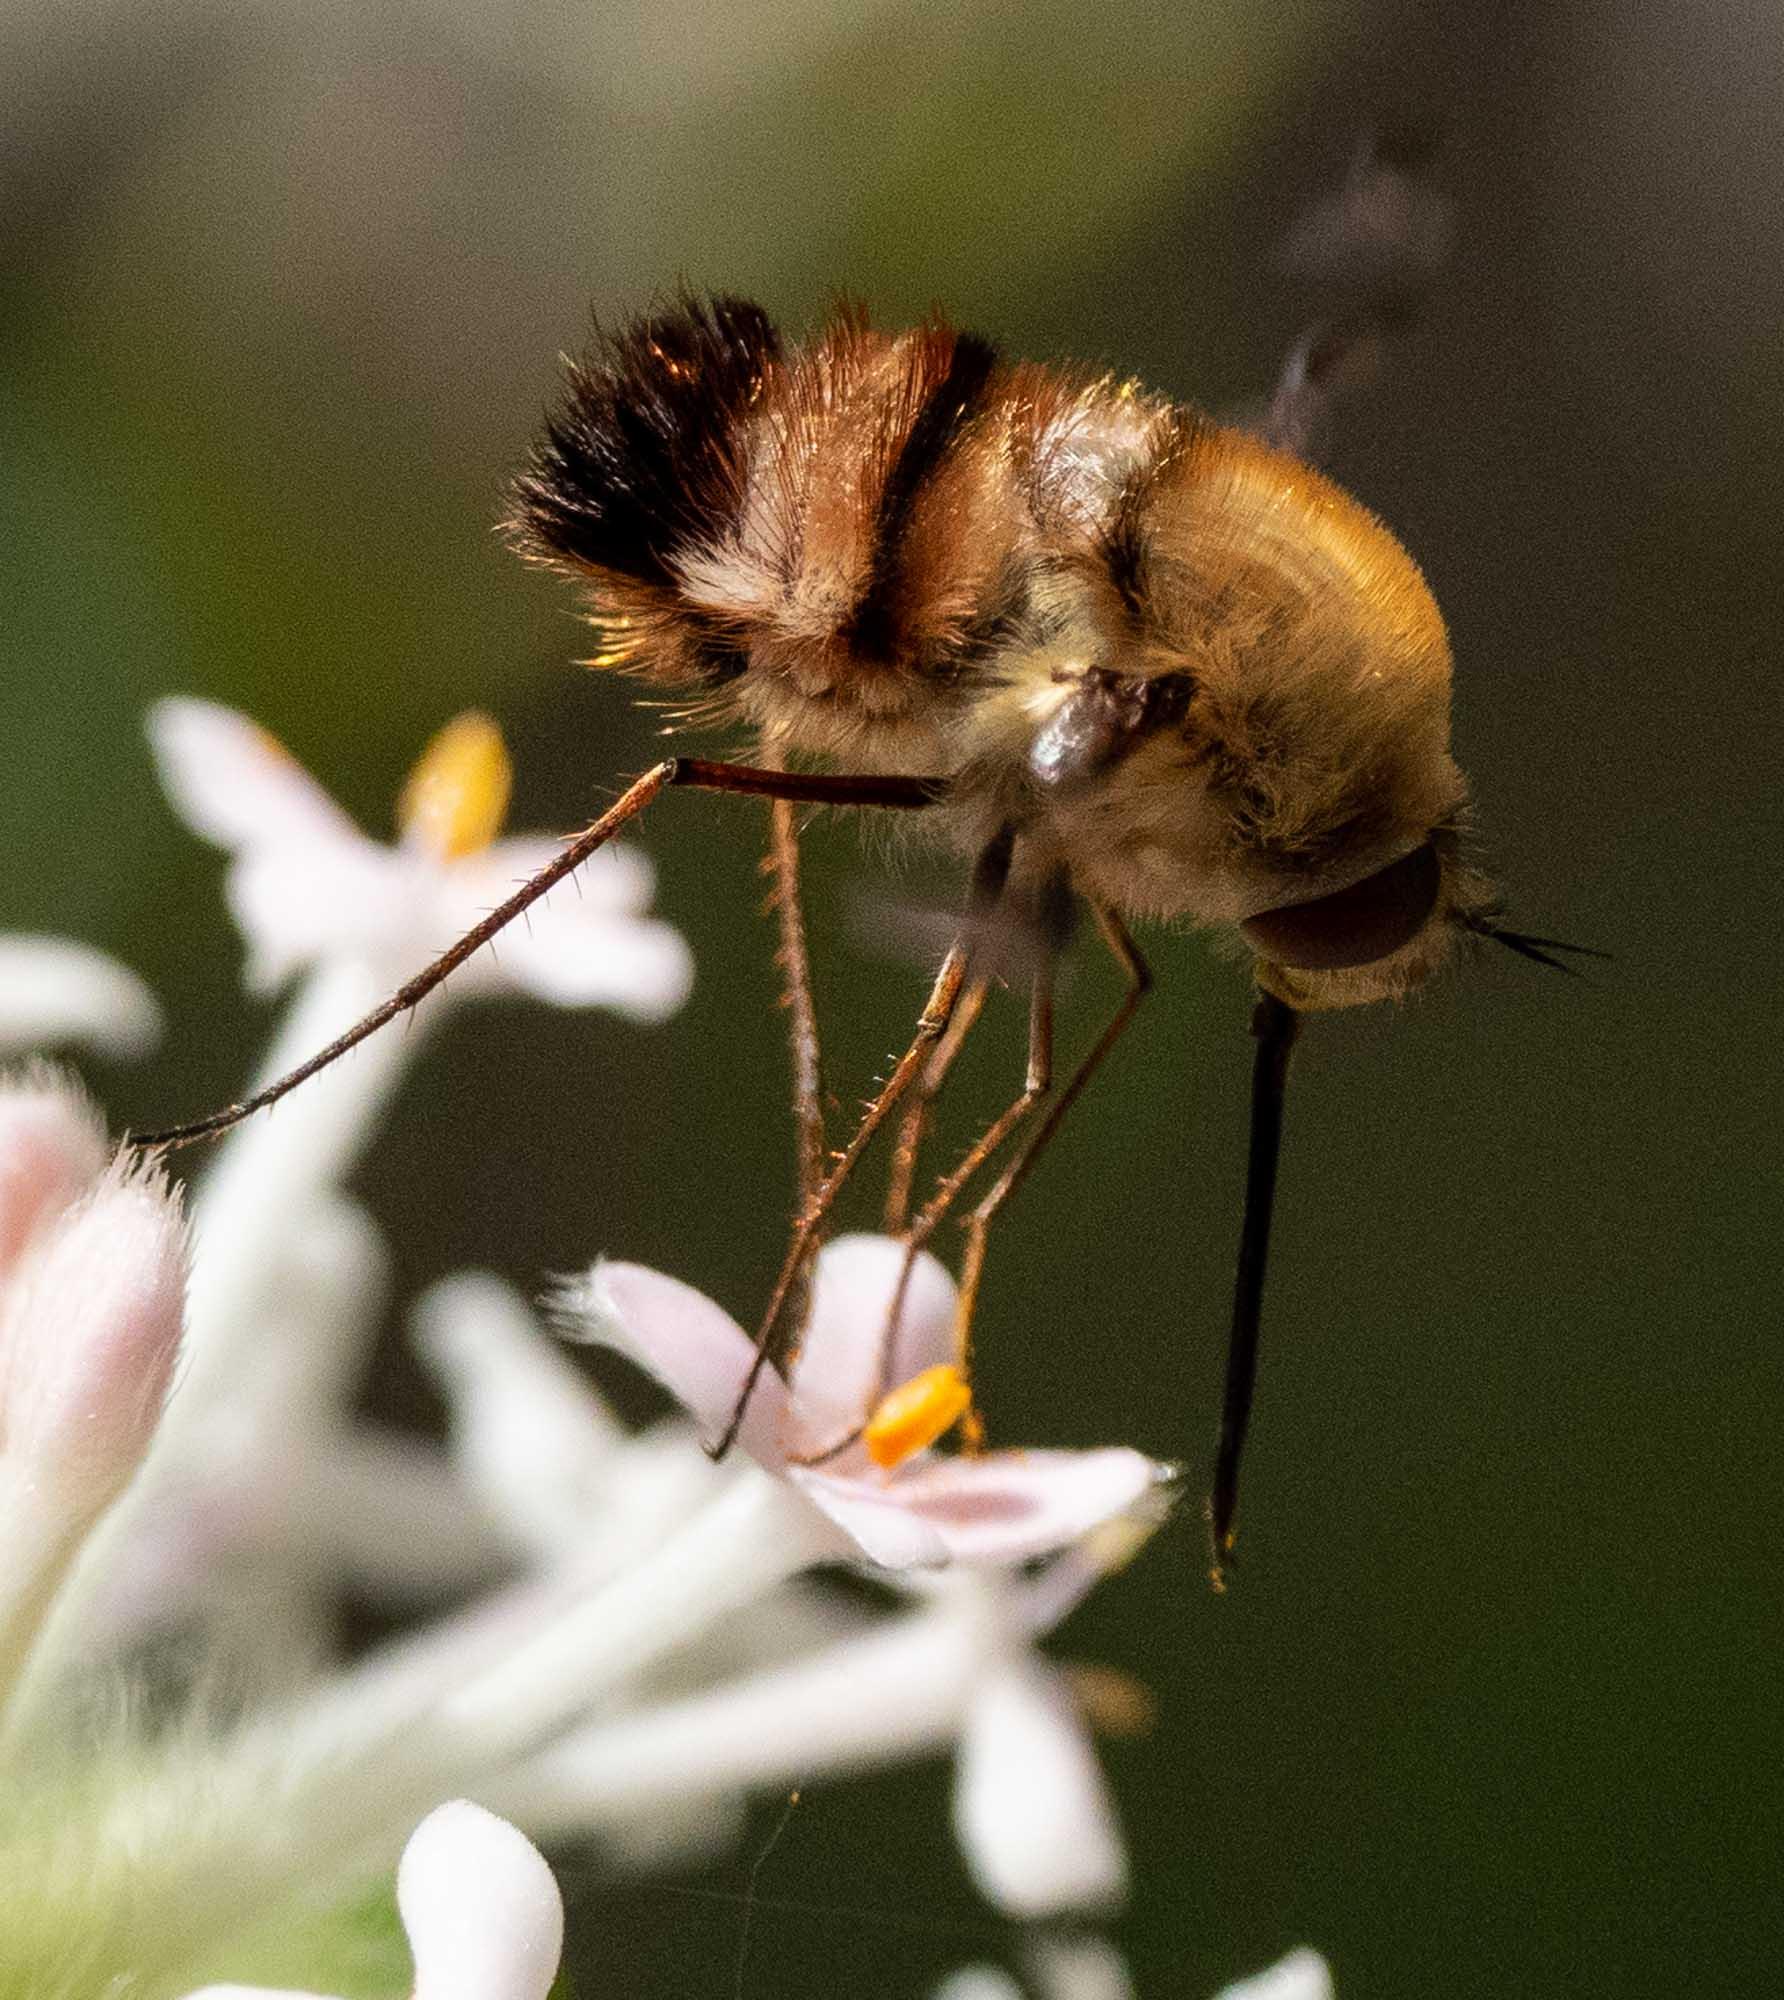 many bee flies probed the Pimelea